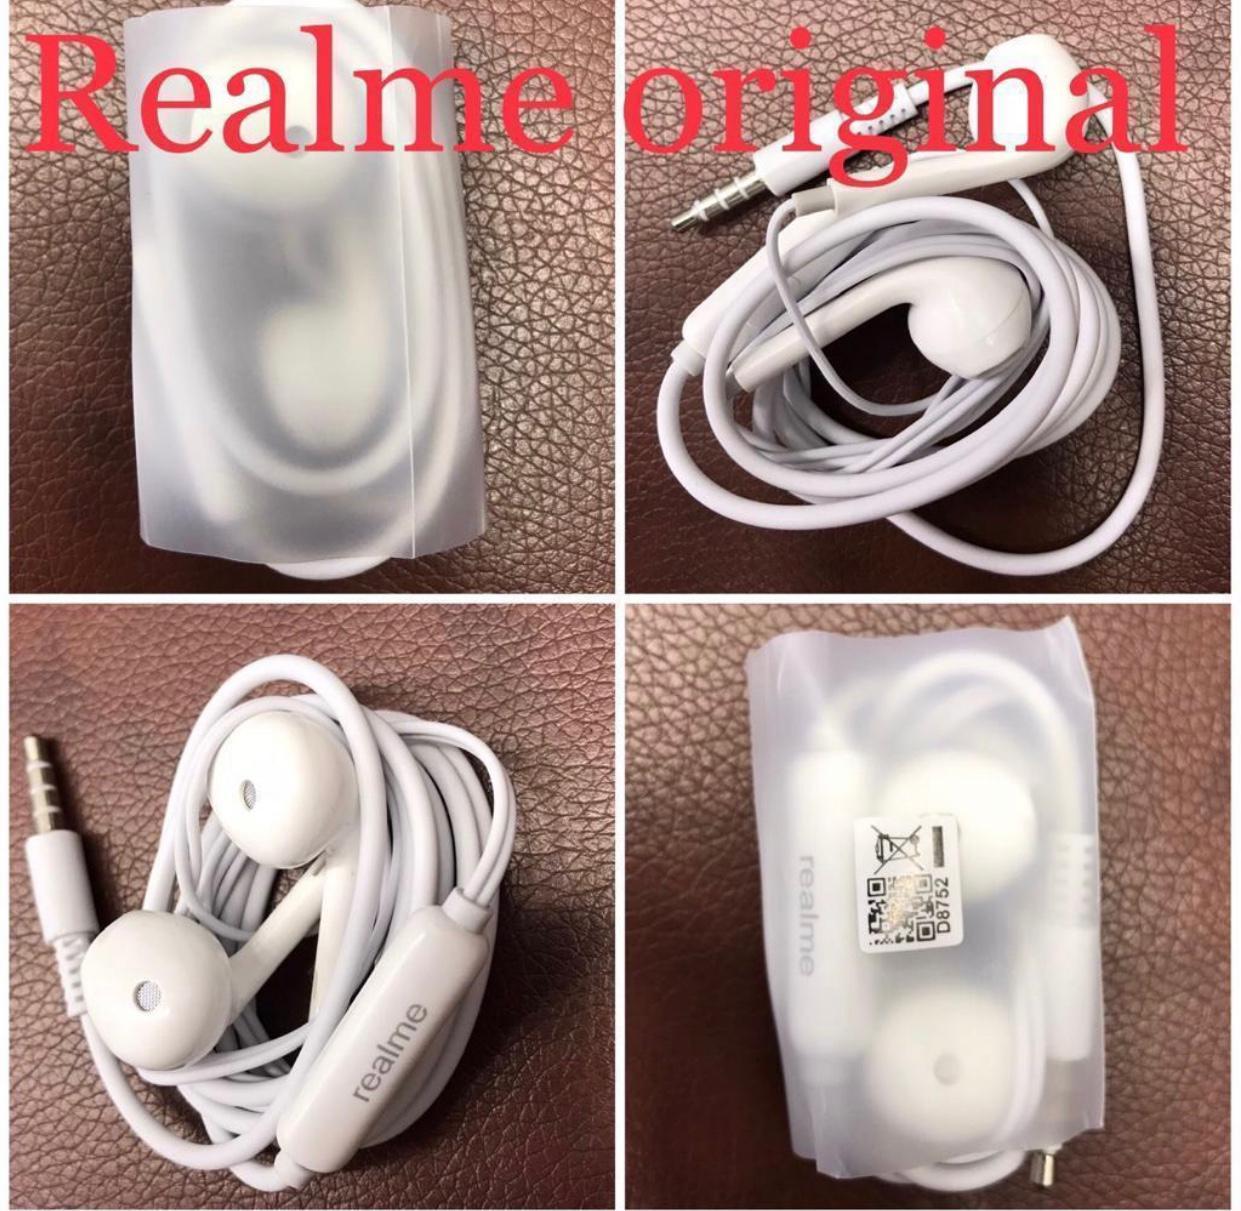 Realme_Handfree Orignal High Quality For Smart Phone All Mobile Earphone Hight Quality Original Headphone